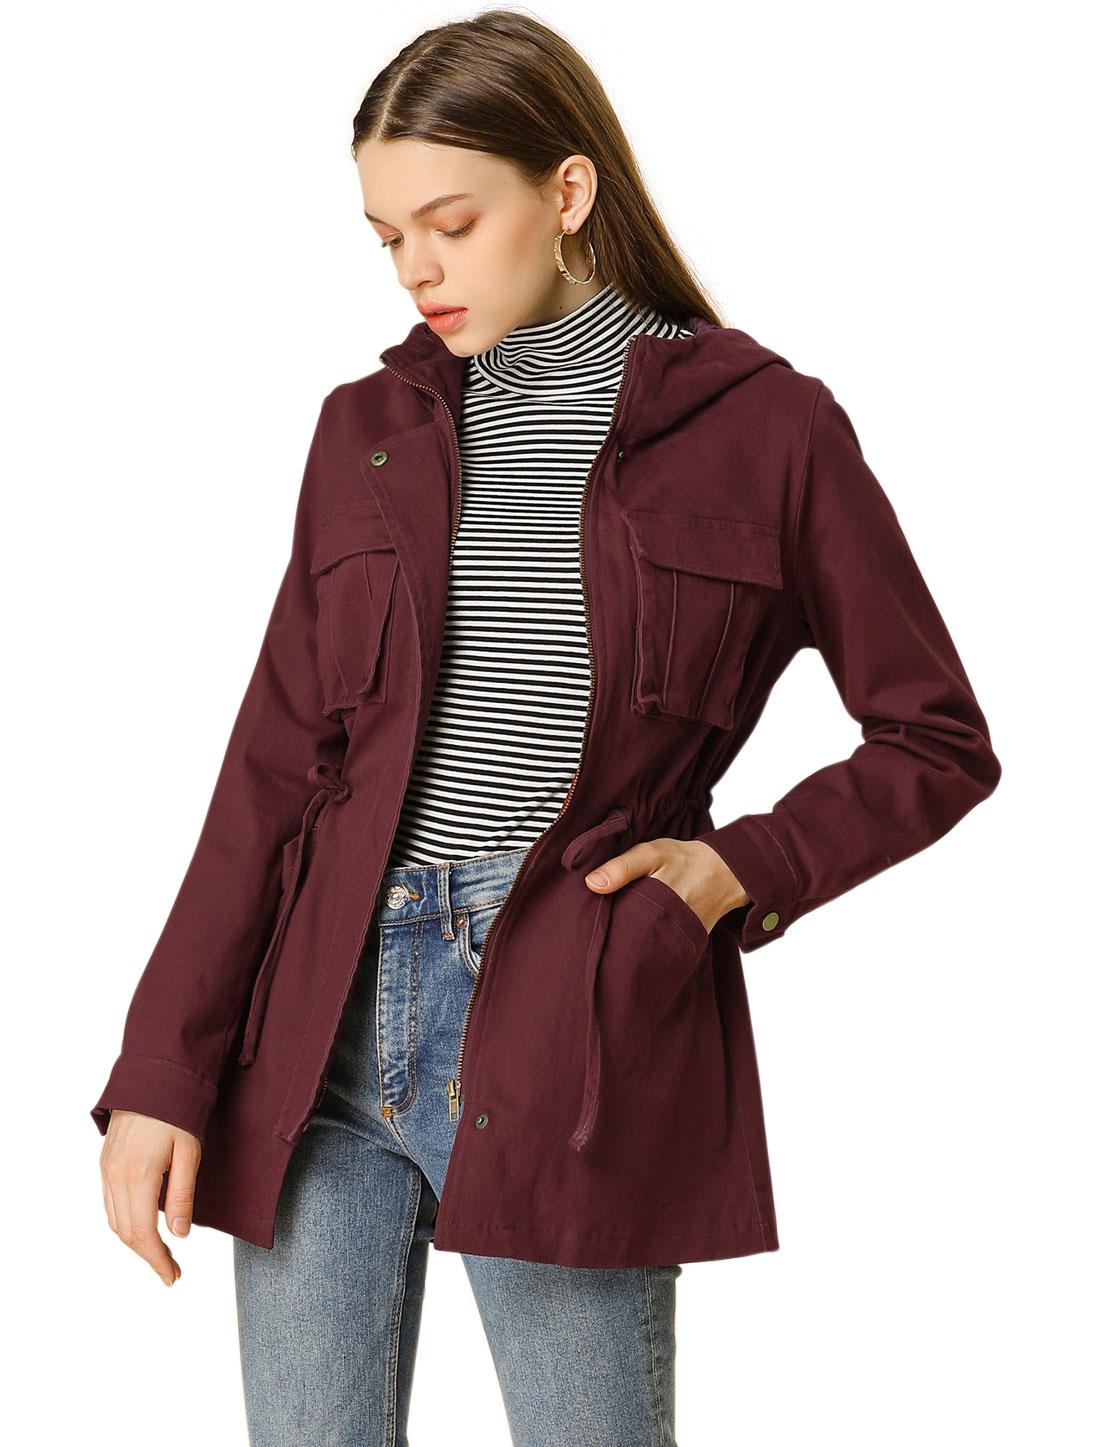 Allegra K Women's Single Breasted Zip Up Drawstring Waist Jacket Brick Red XL